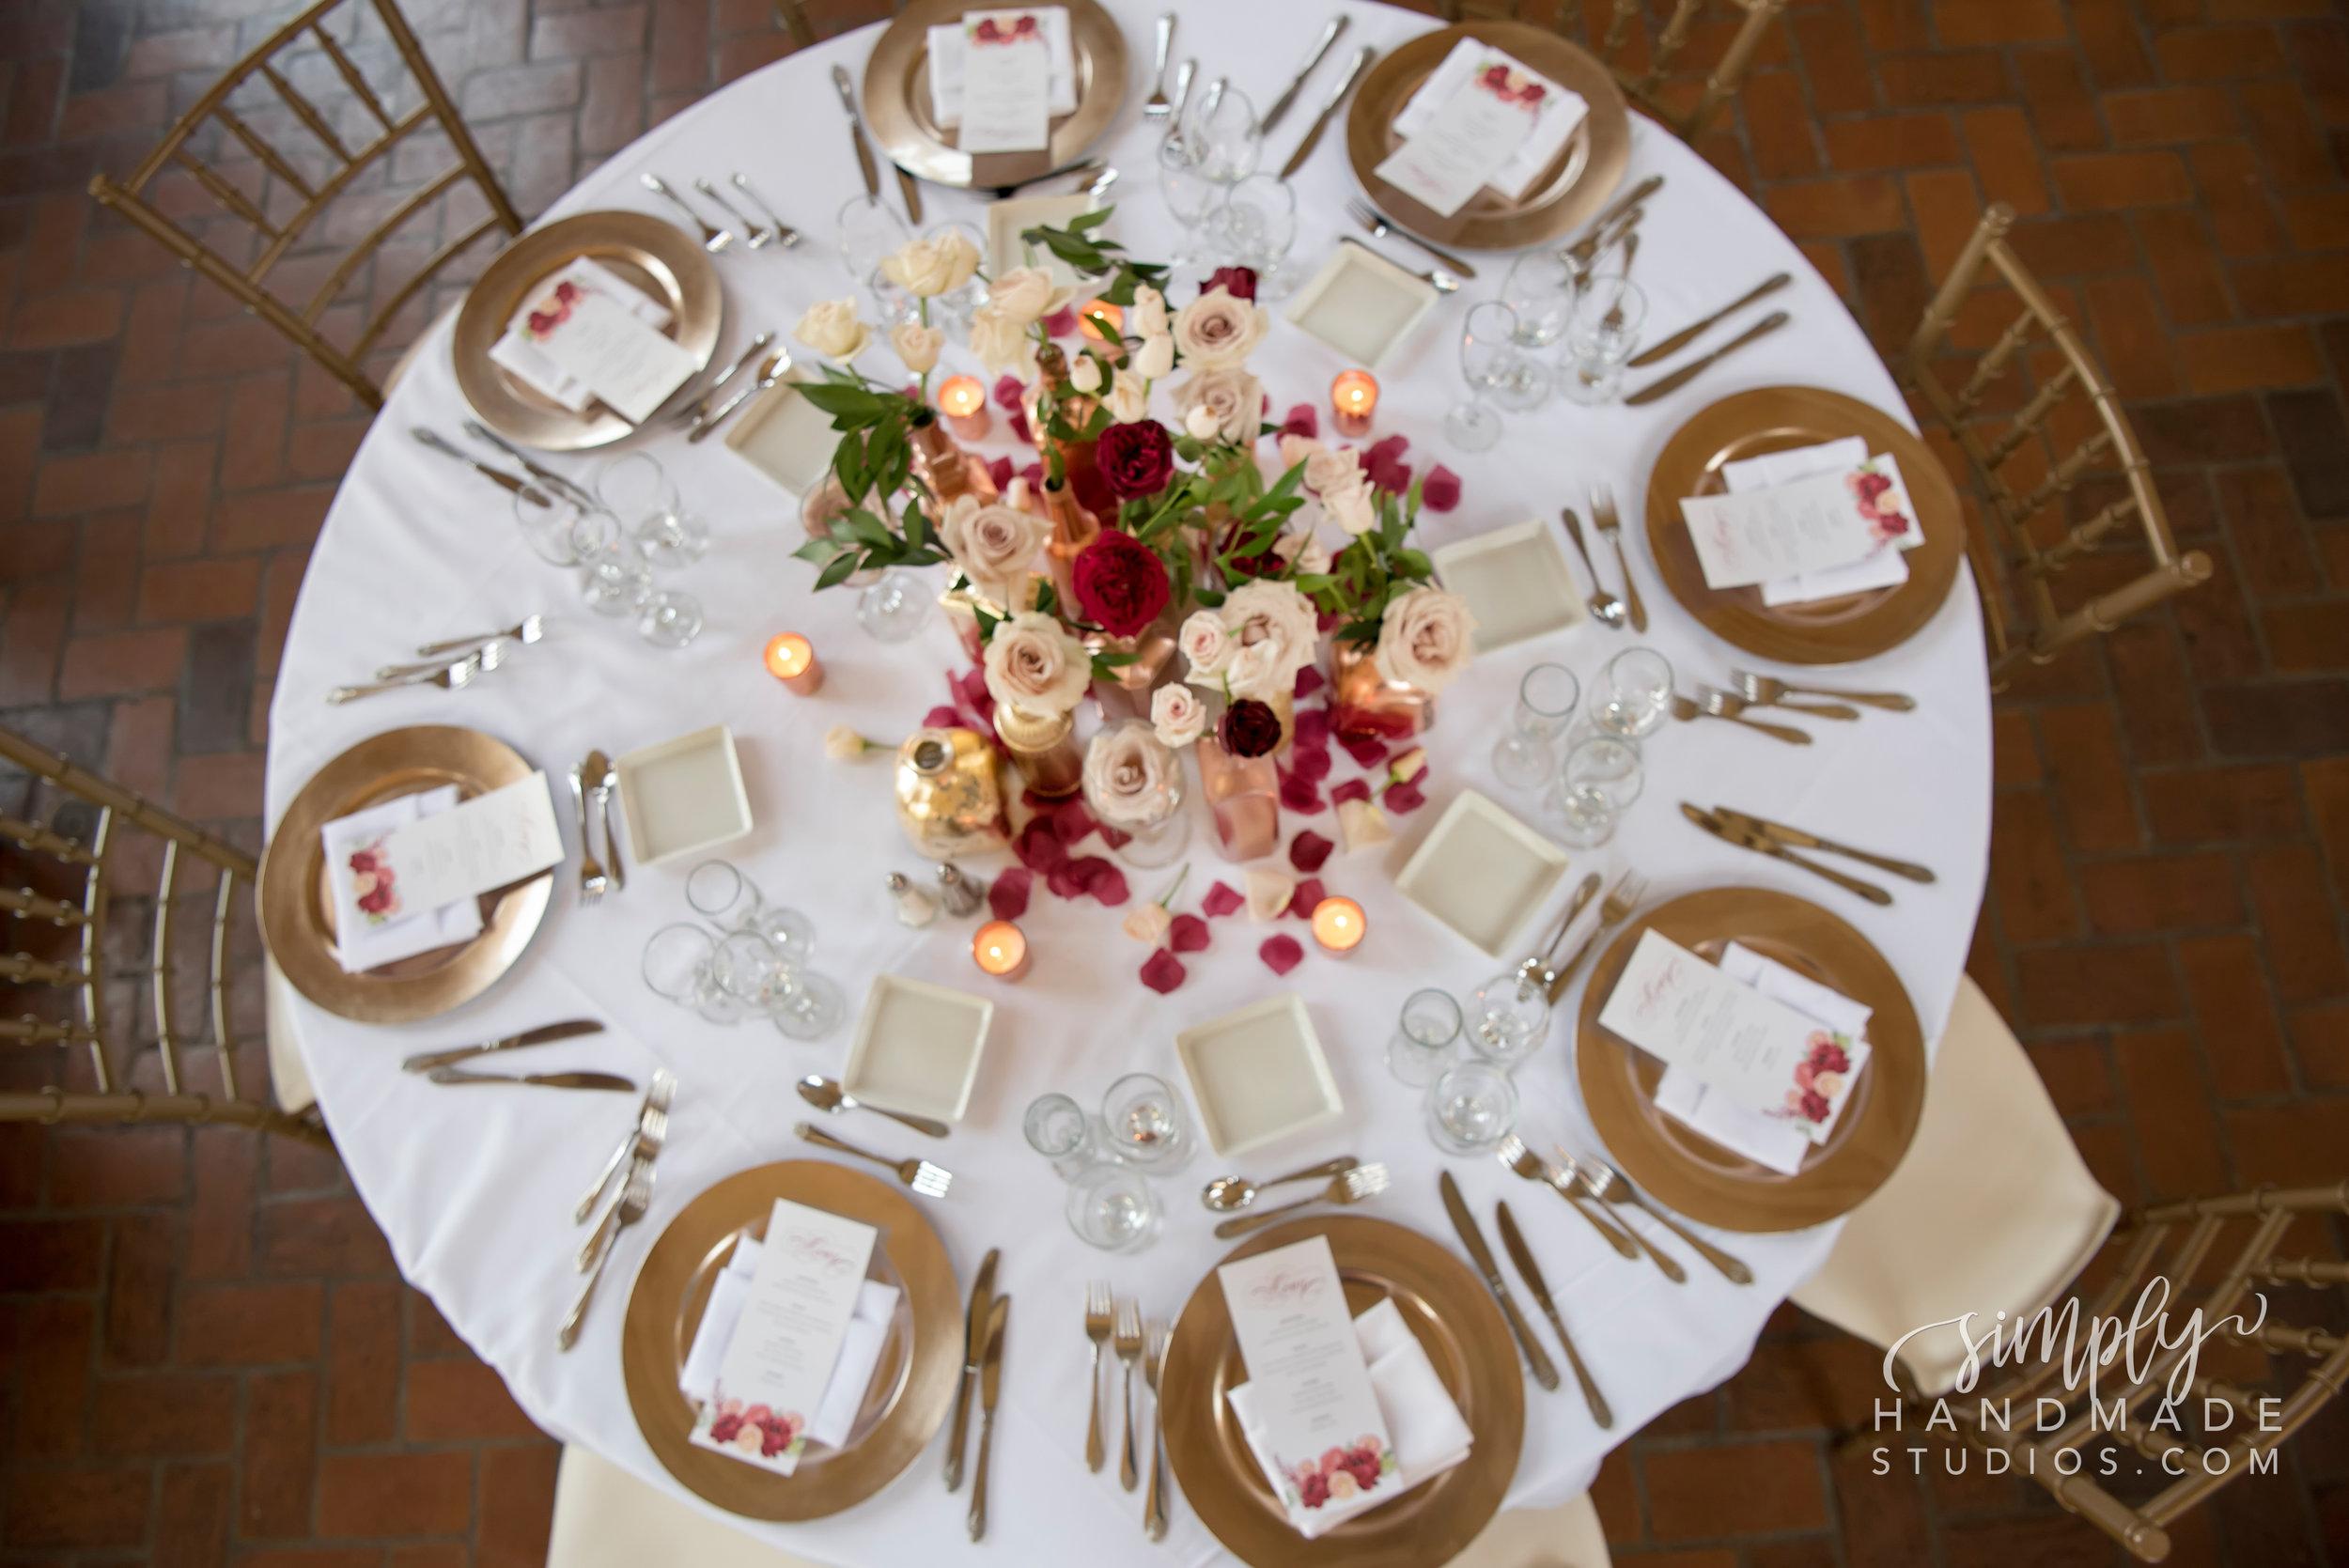 DIY Wedding Menu Template - Simply Handmade Studios